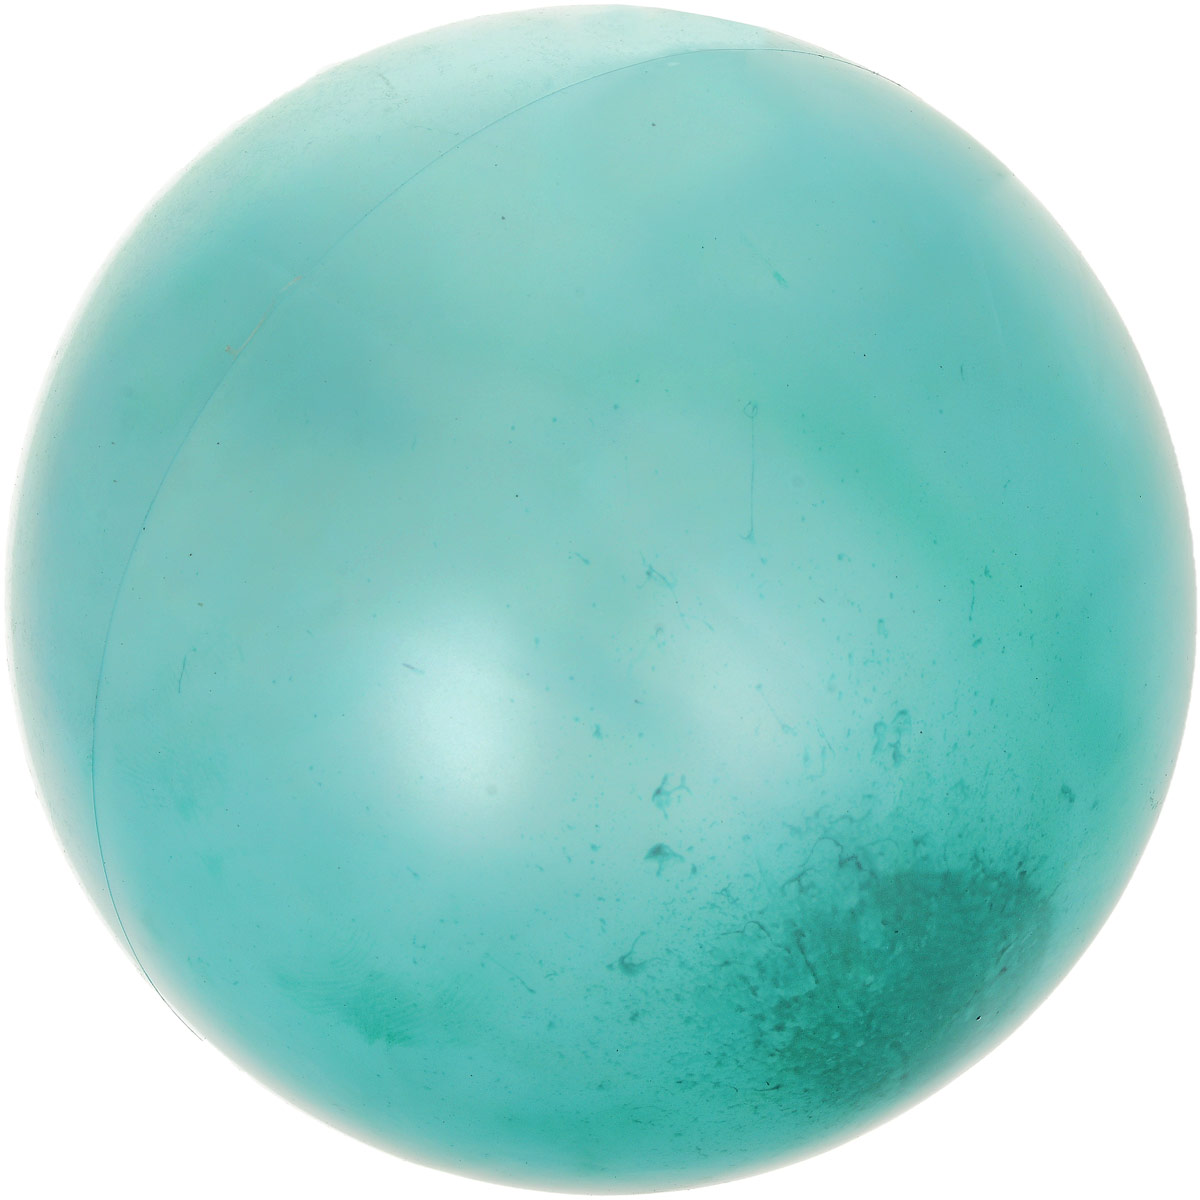 Забияка Мяч Слияние цвета цвет зеленый 20 см игрушка забияка армия zy260591 121537